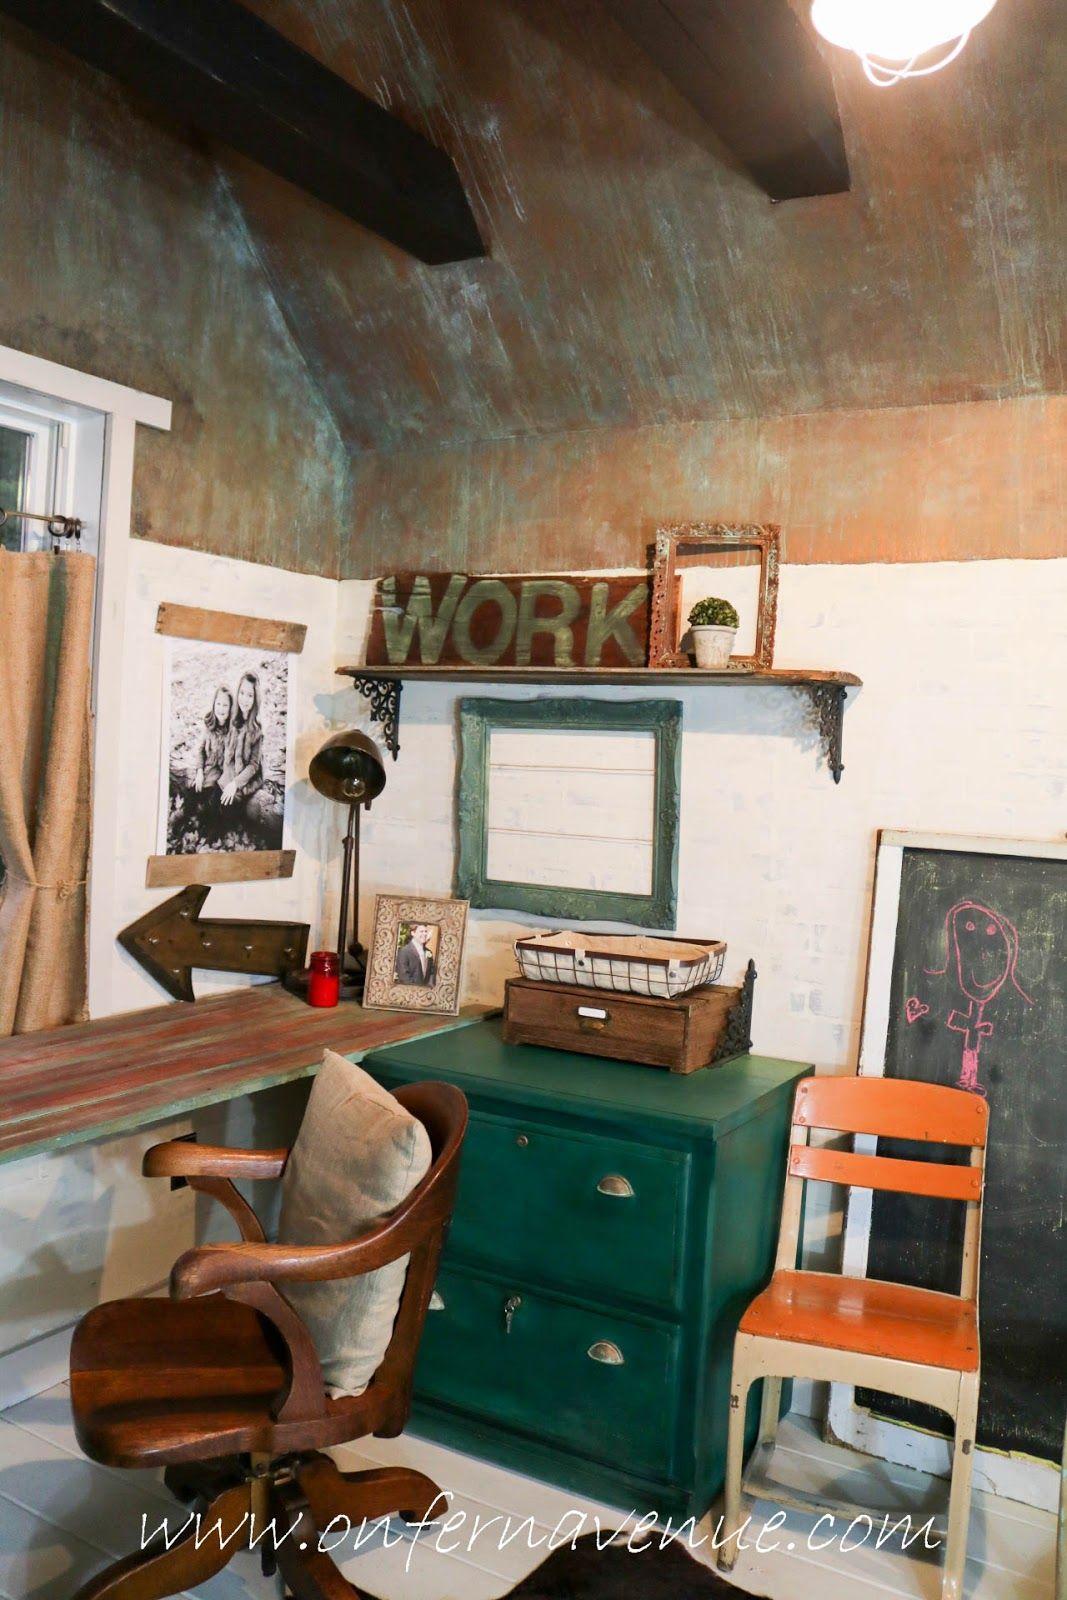 Onfernavenue desk build using wise owl paint in neptune